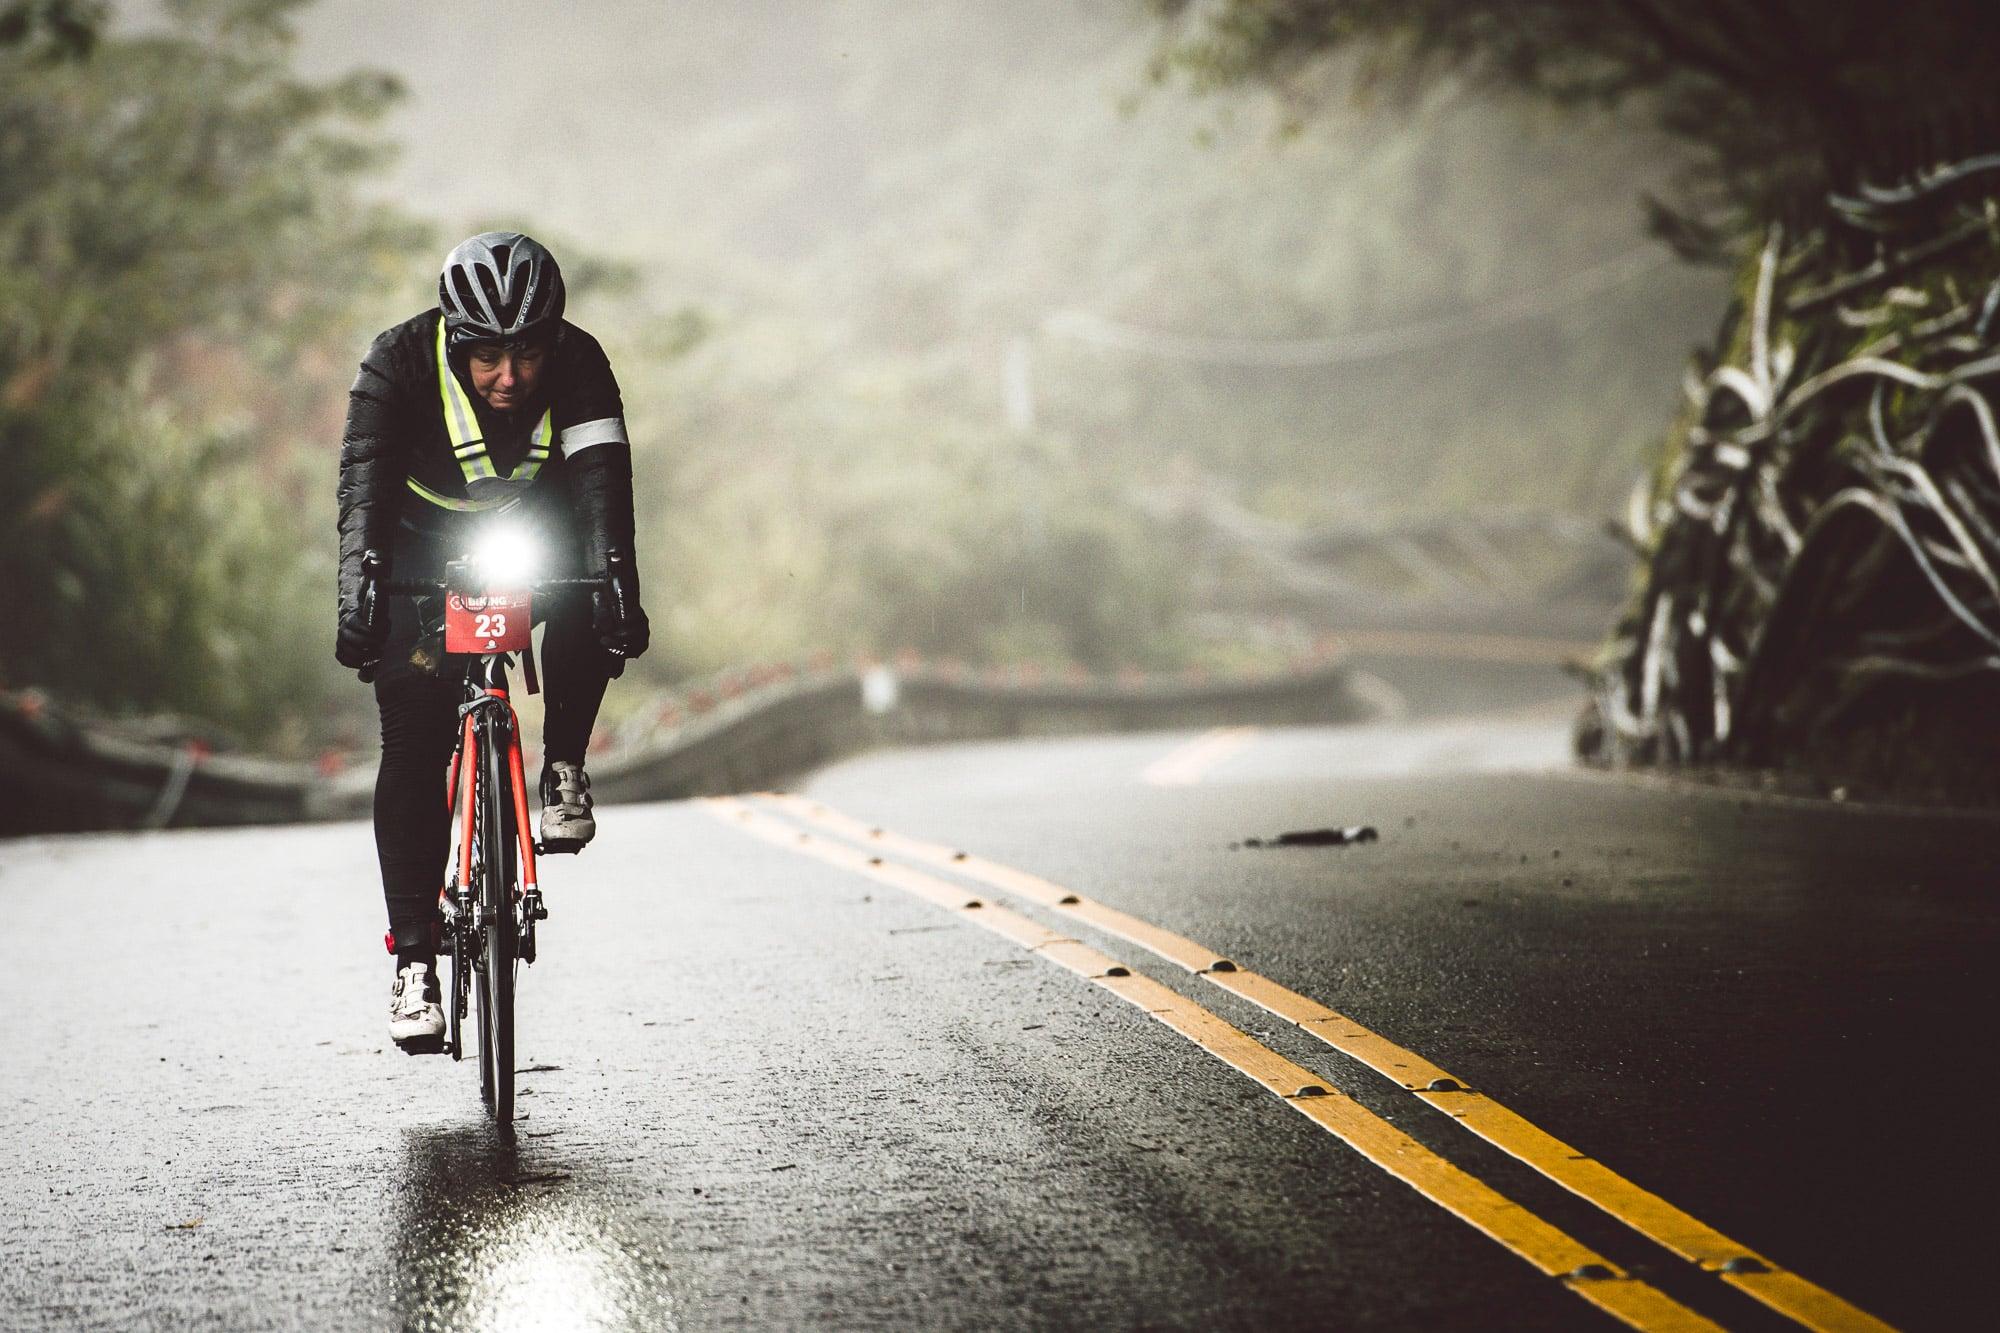 Tough route in tough conditions